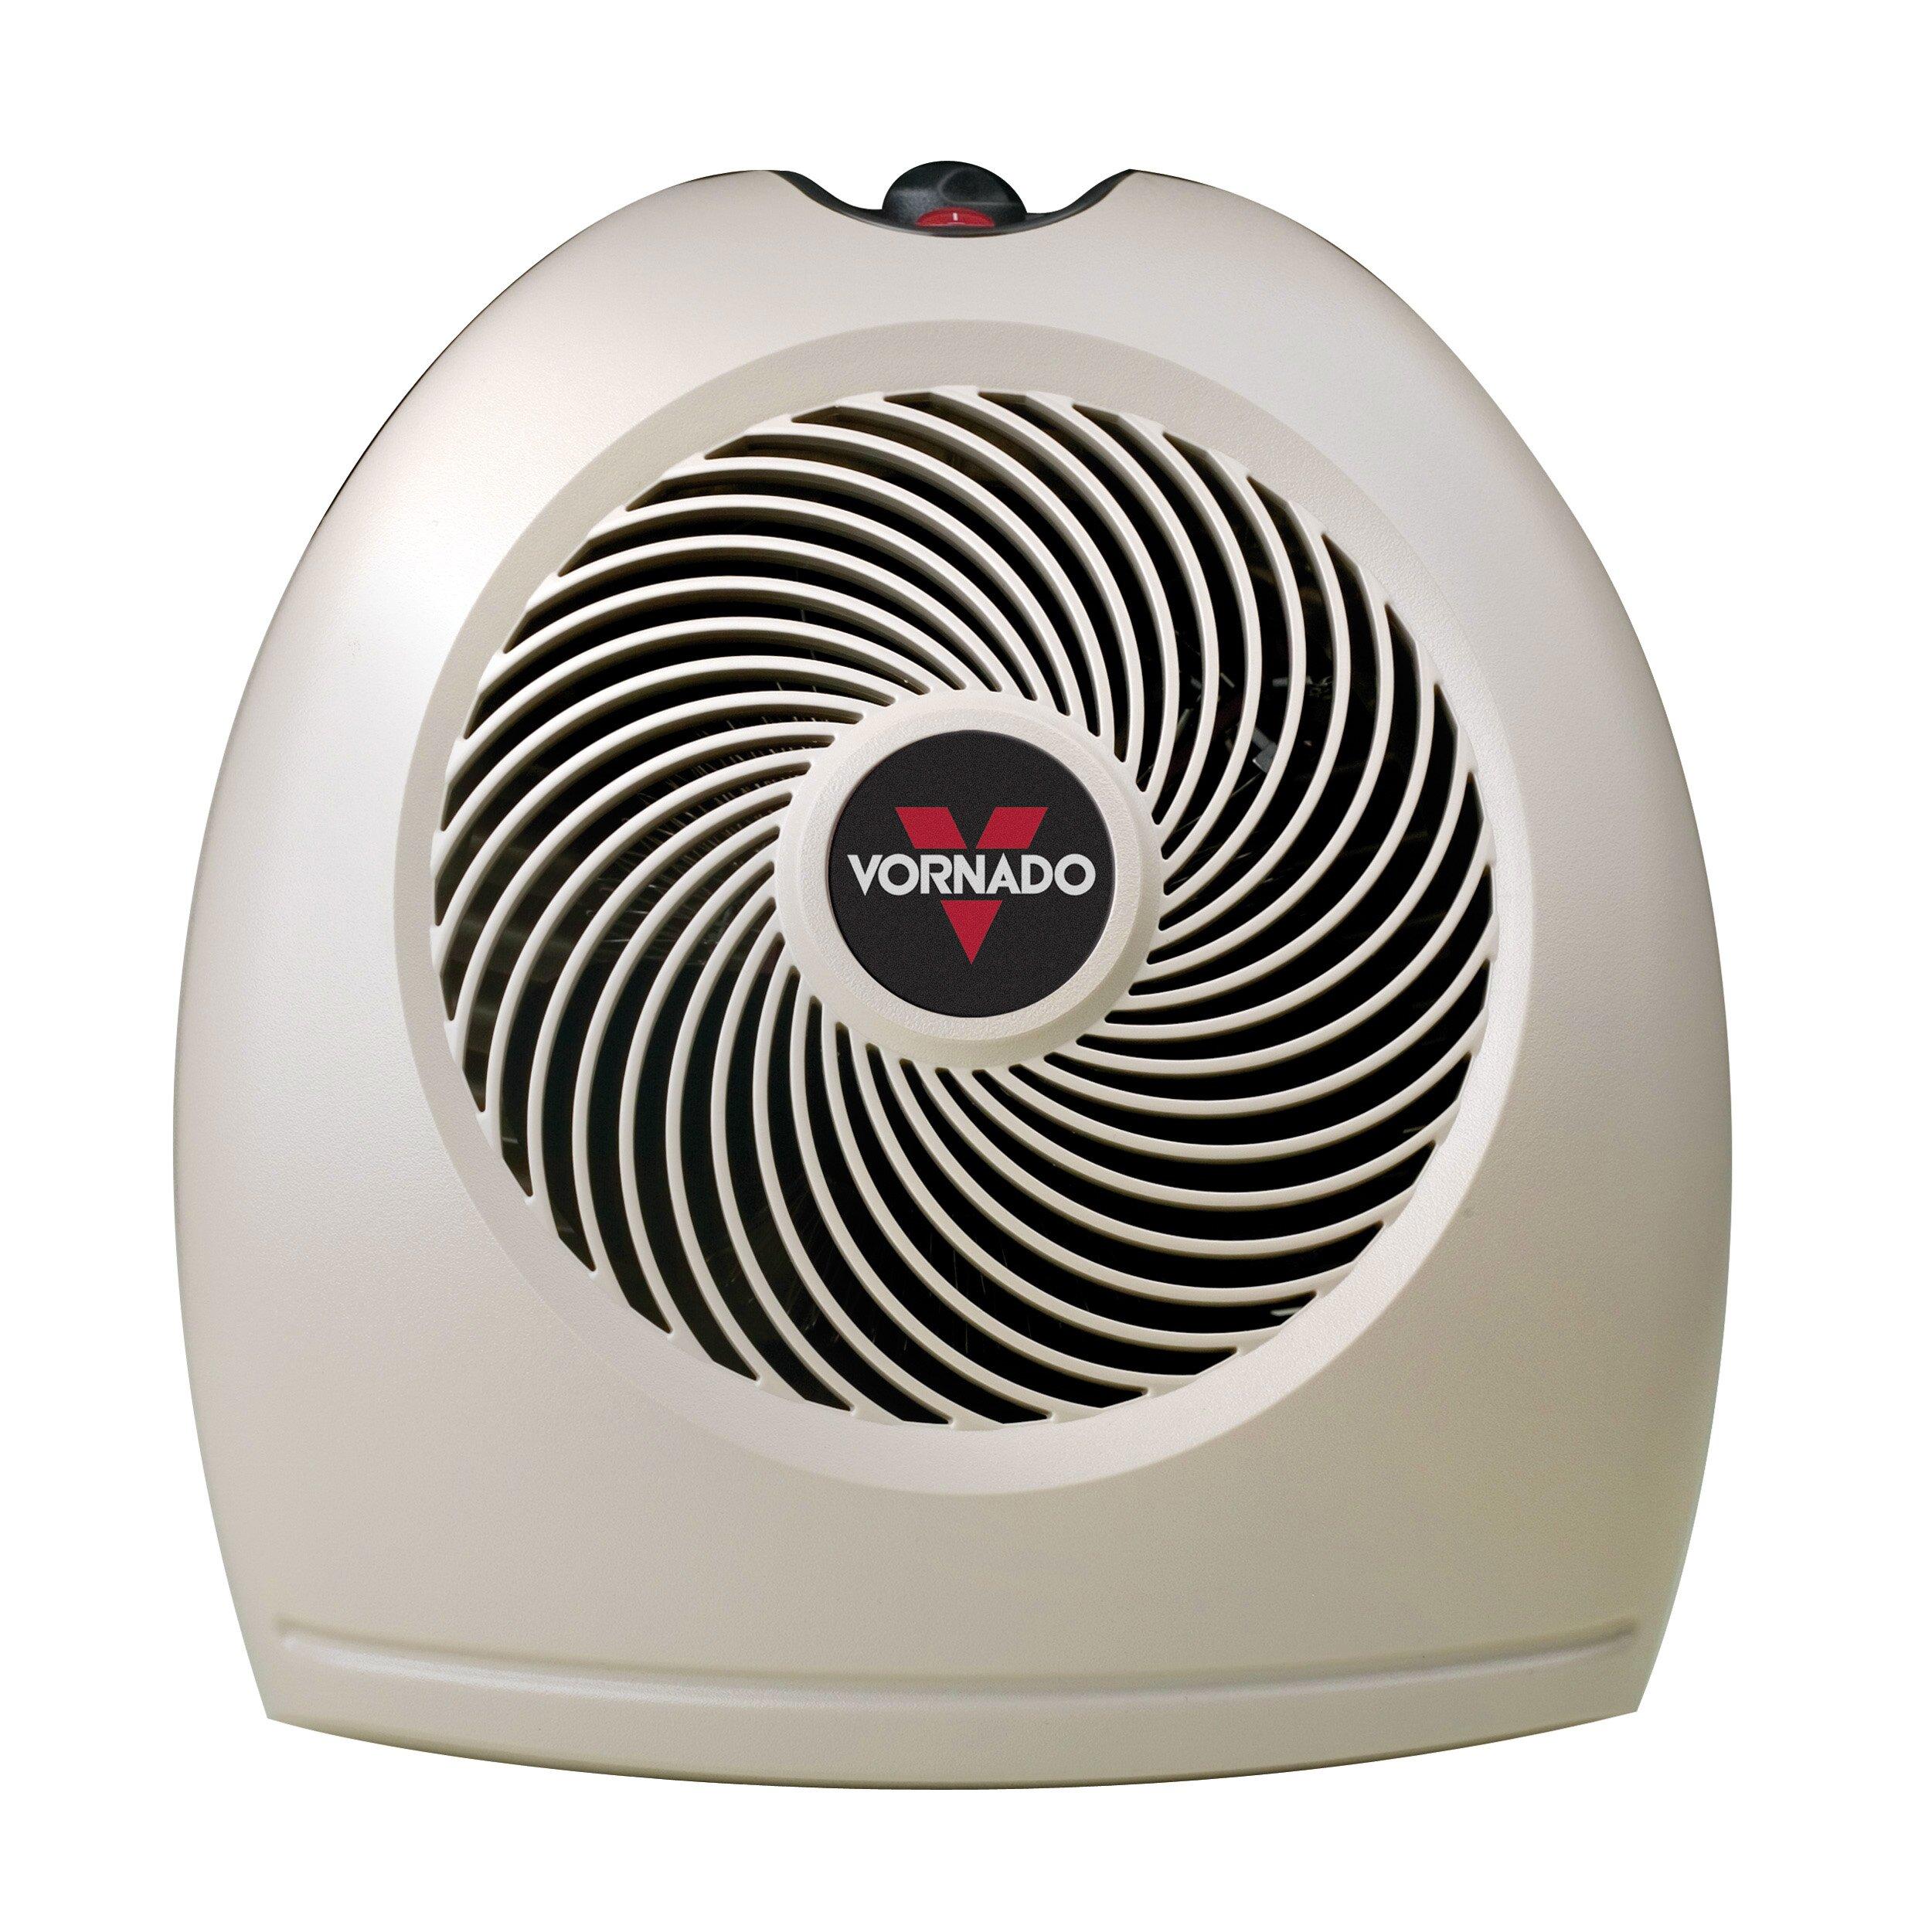 Vornado 1 500 Watt Portable Electric Fan Compact Heater